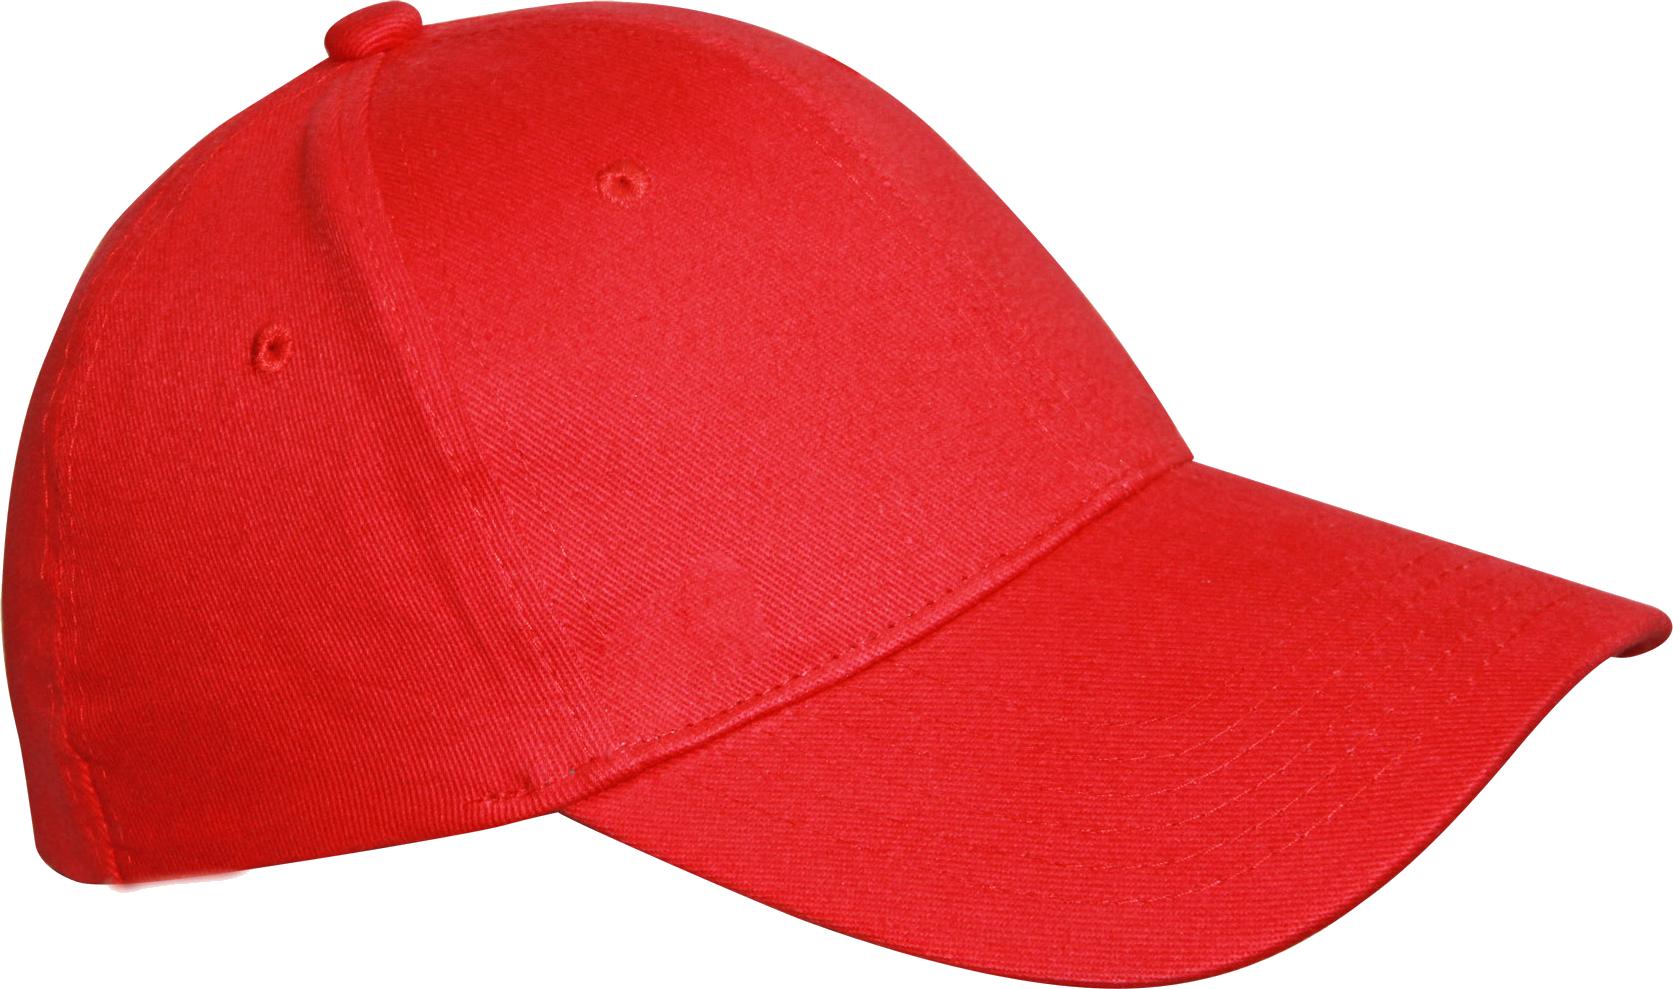 Baseball cap clipart png jpg library Baseball cap PNG image free download jpg library